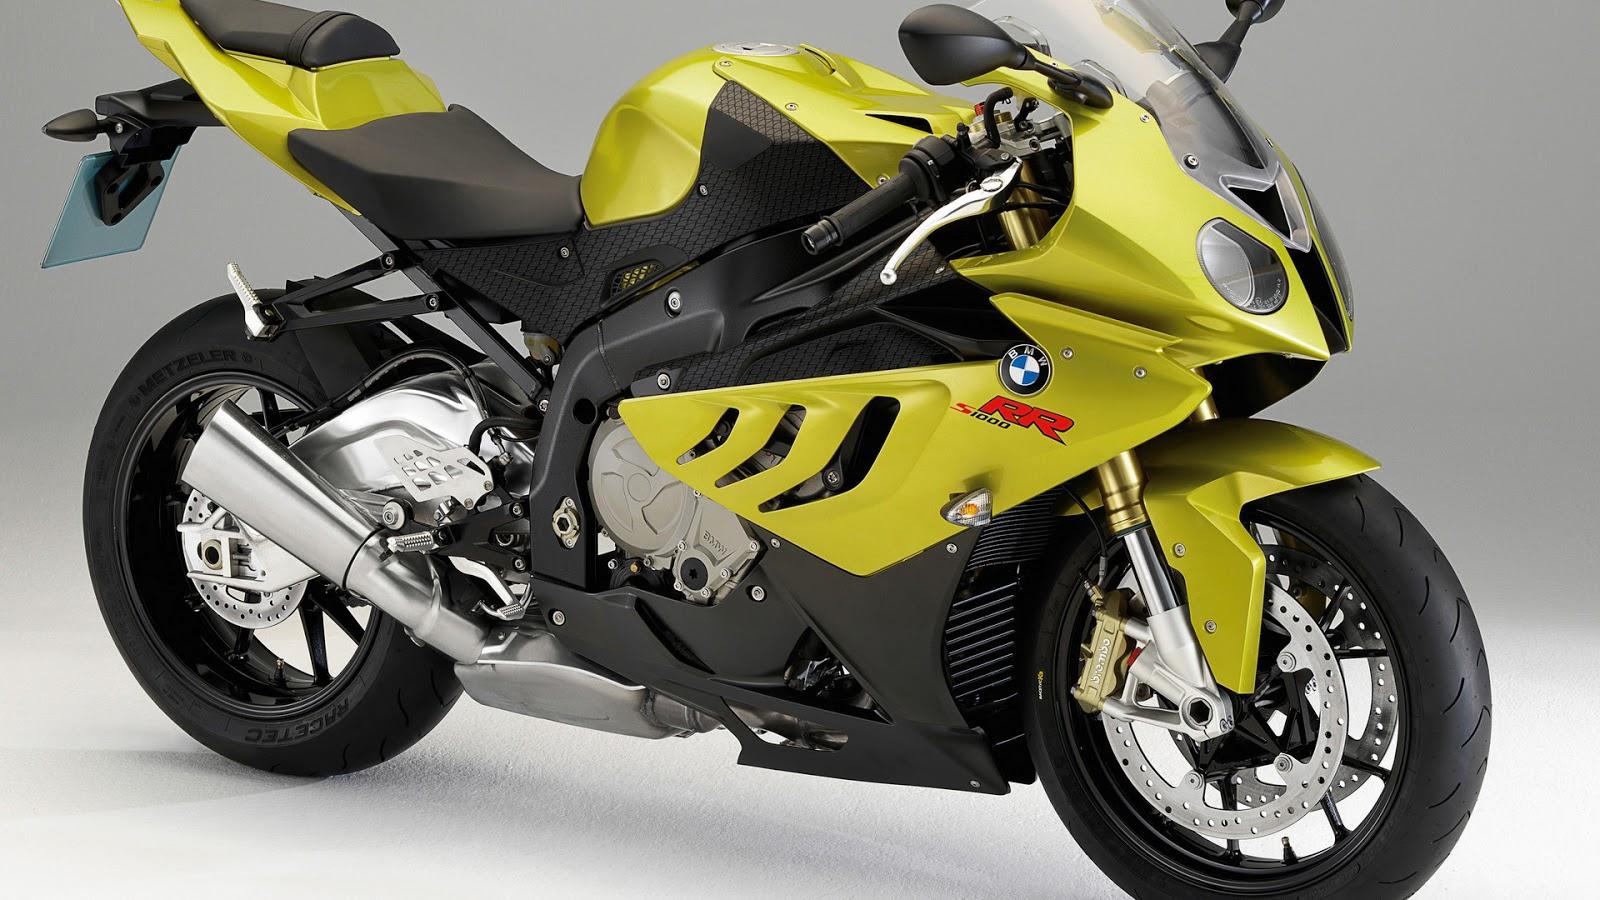 http://3.bp.blogspot.com/-Sc9vqFlriok/UJbMN55XbgI/AAAAAAAAH4w/TePmoHitCIE/s1600/BMW+S1000RR+world\'s+fastest+bike+HD+wallpapers+Image05.jpg